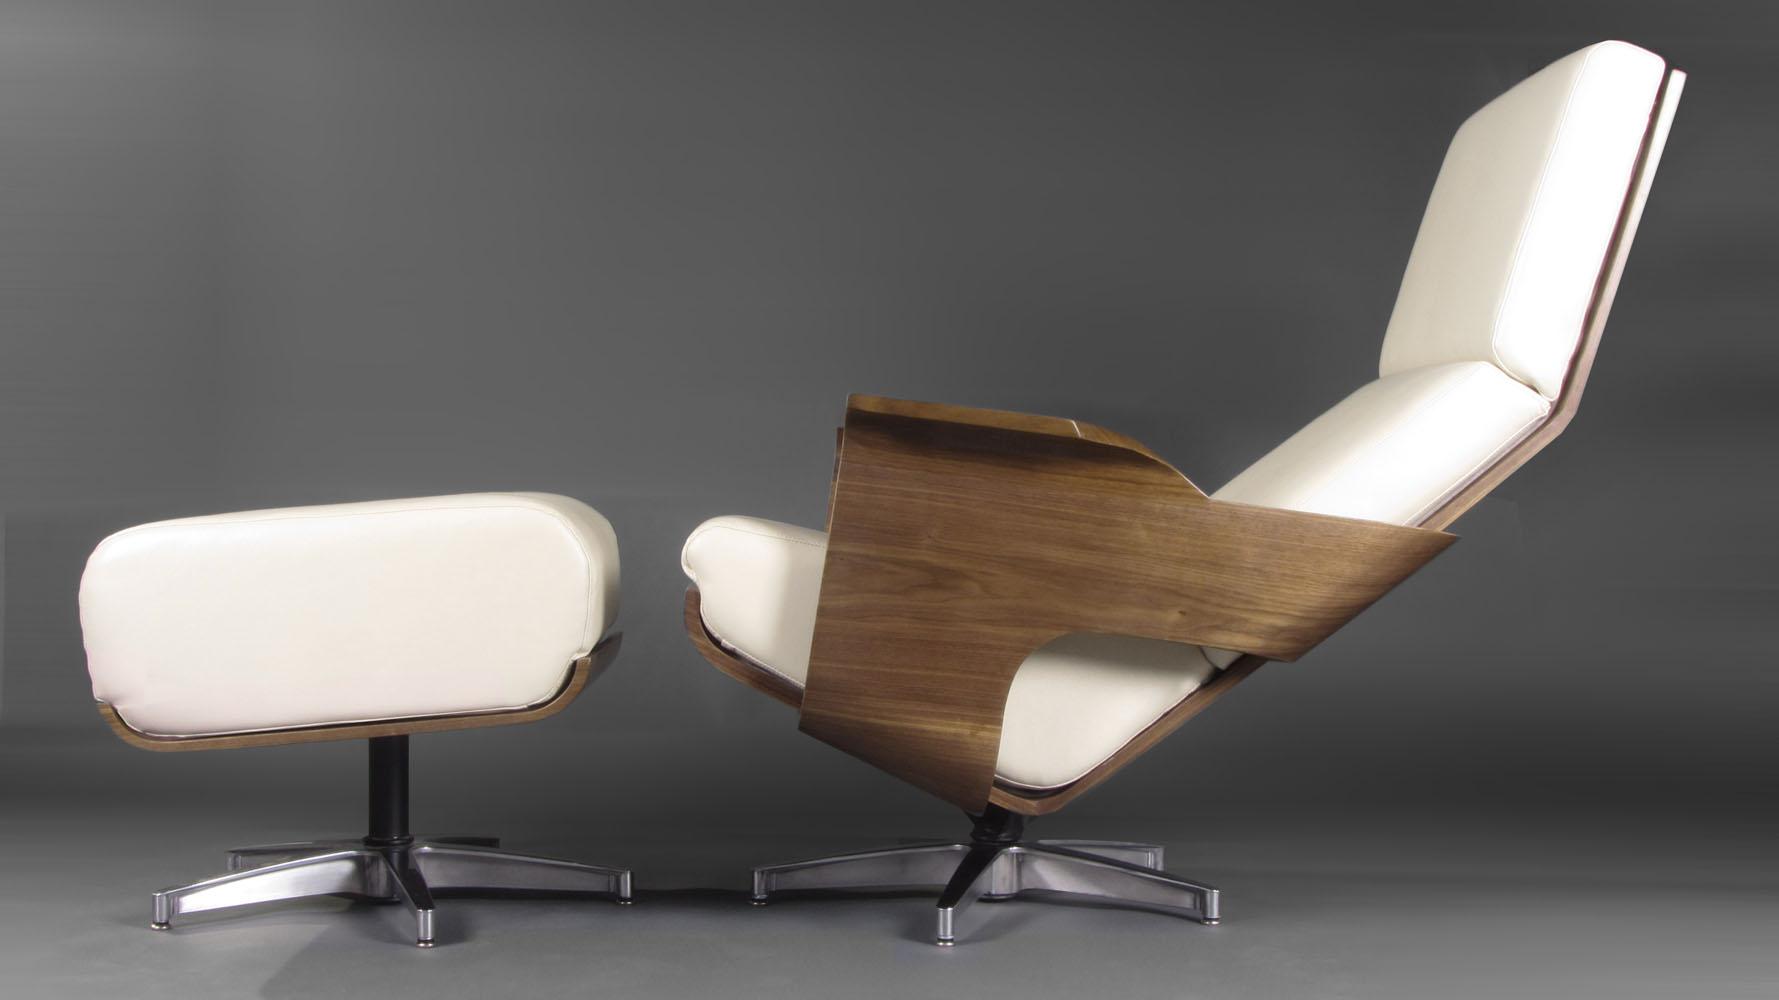 Fullsize Of Comfortable Chair For Reading